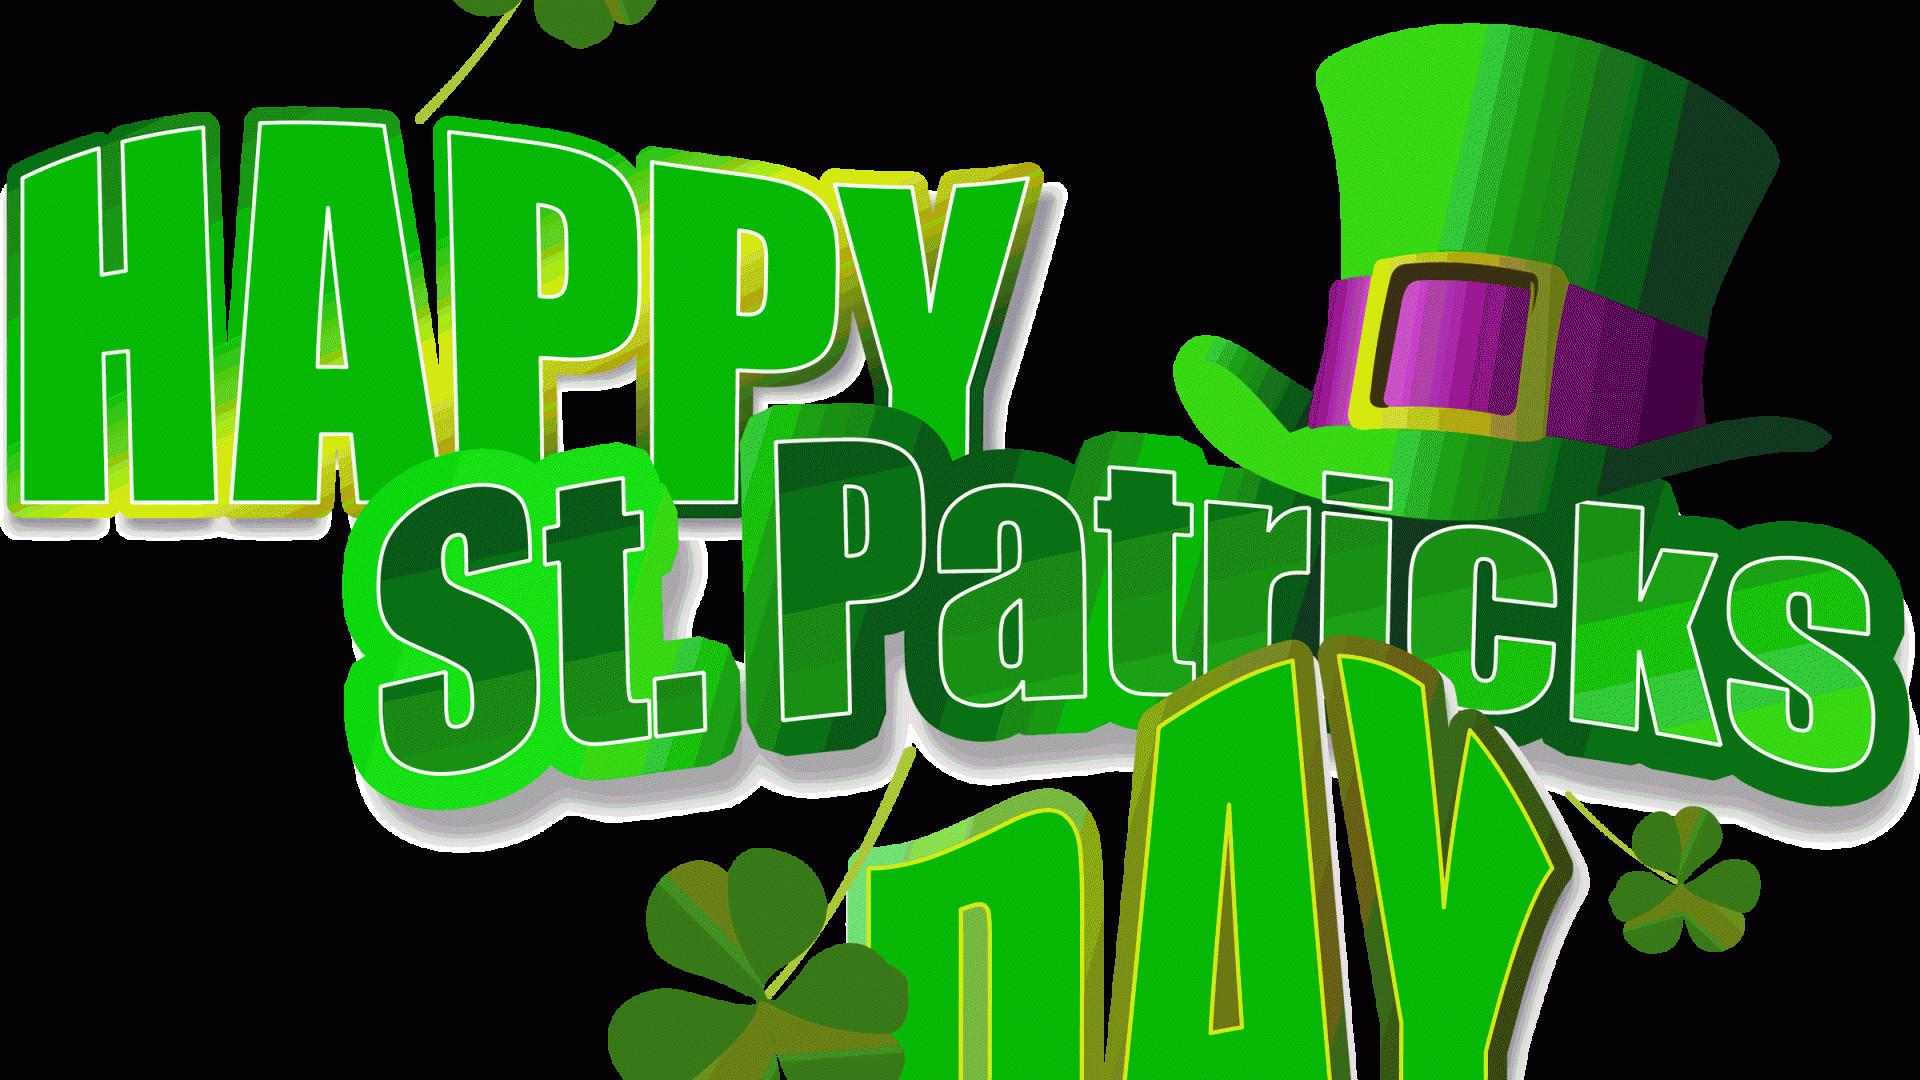 Download 'happy st patricks day' HD wallpaper